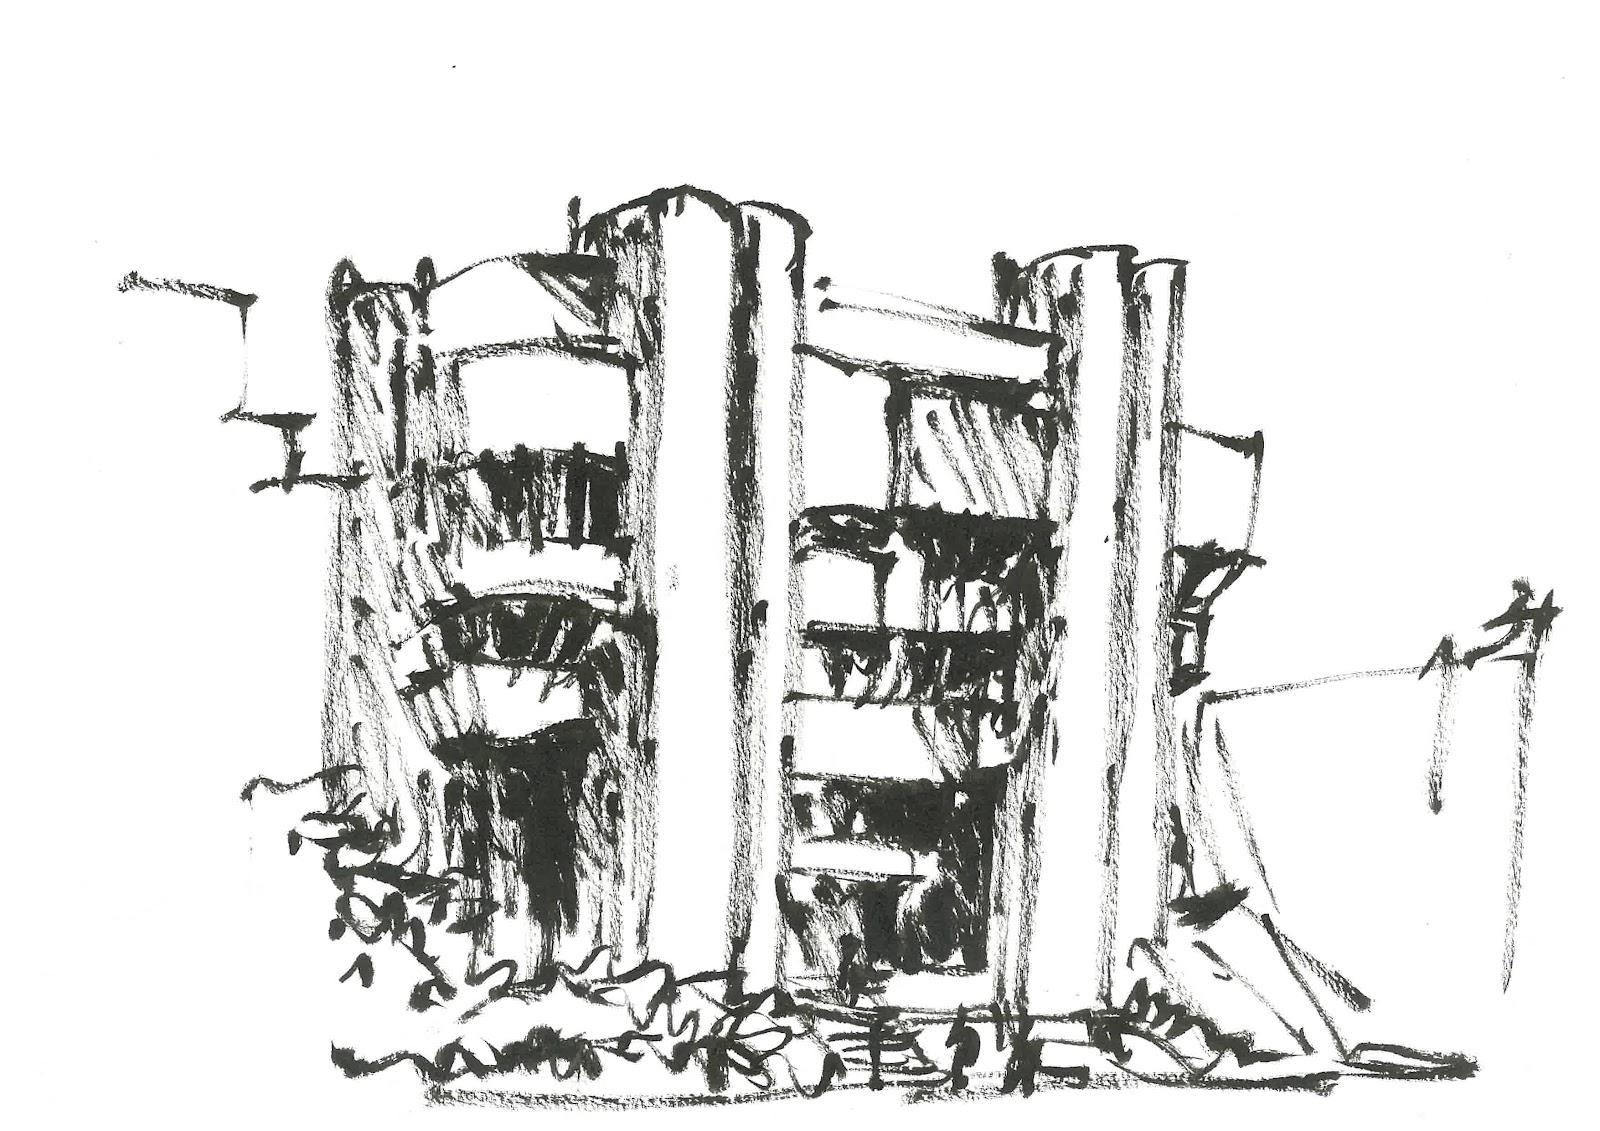 satu mare city hall brutalism